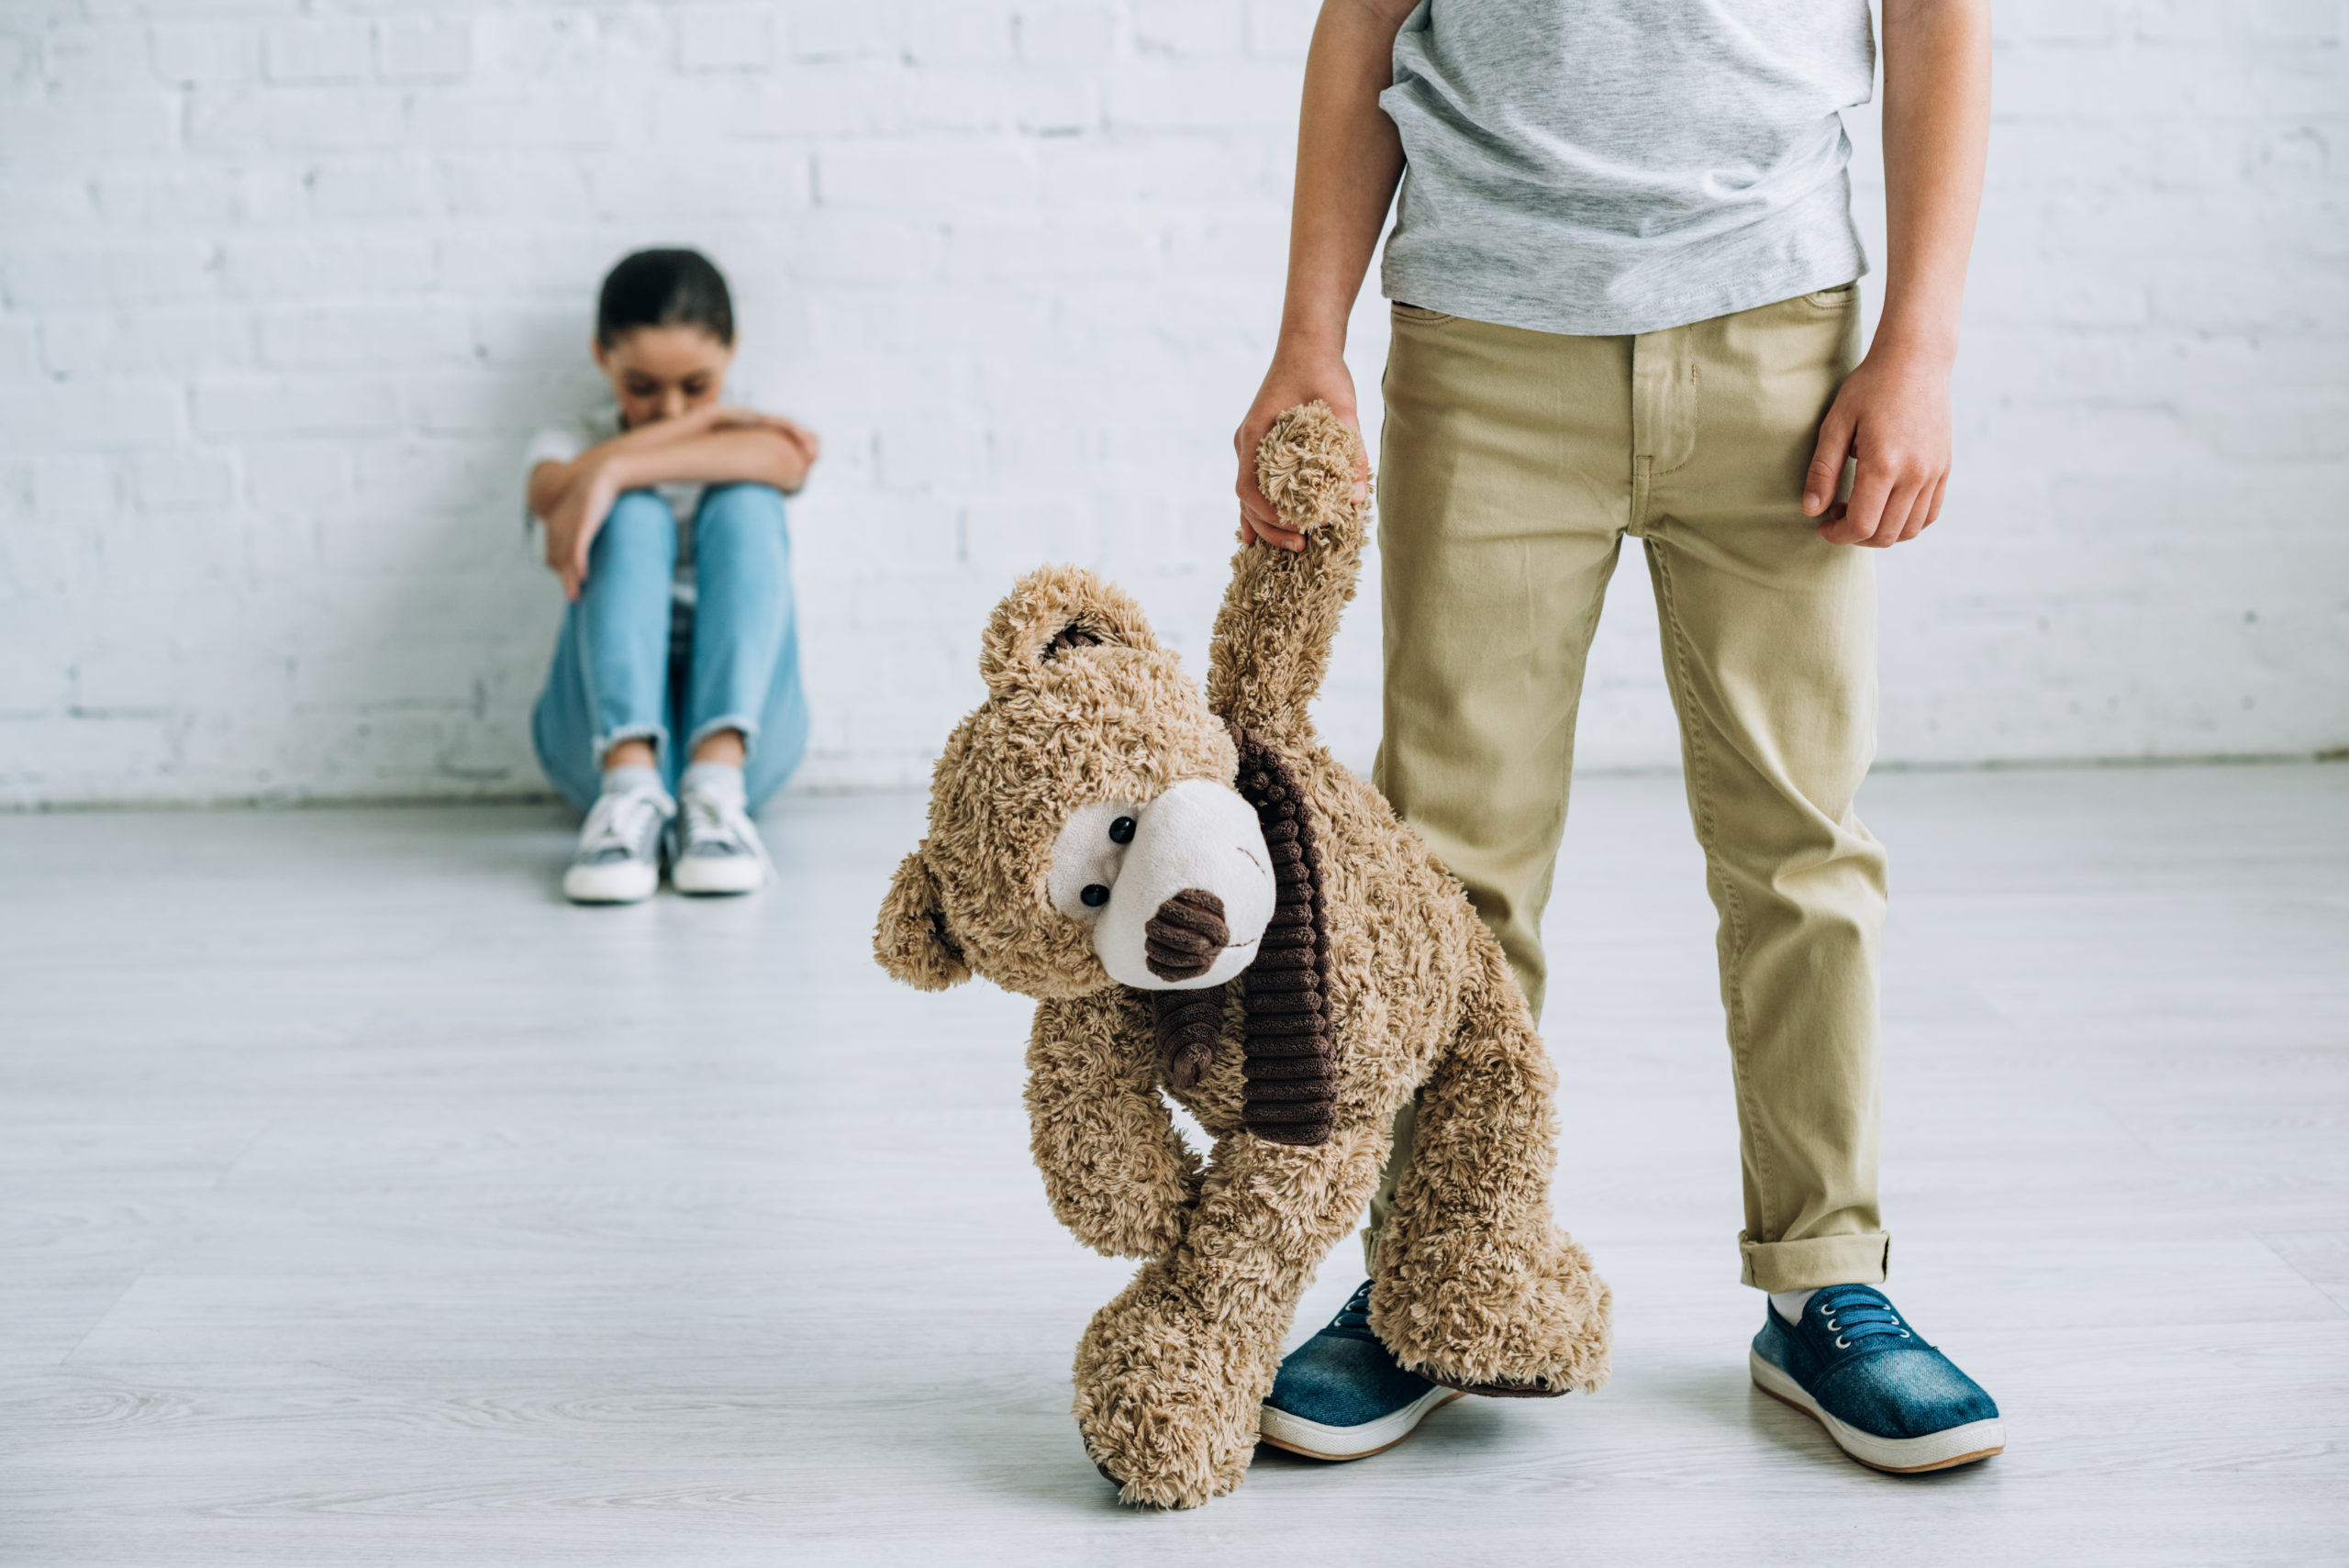 Man holding teddy bear - child in background - Depositphotos_266114350_xl-2015